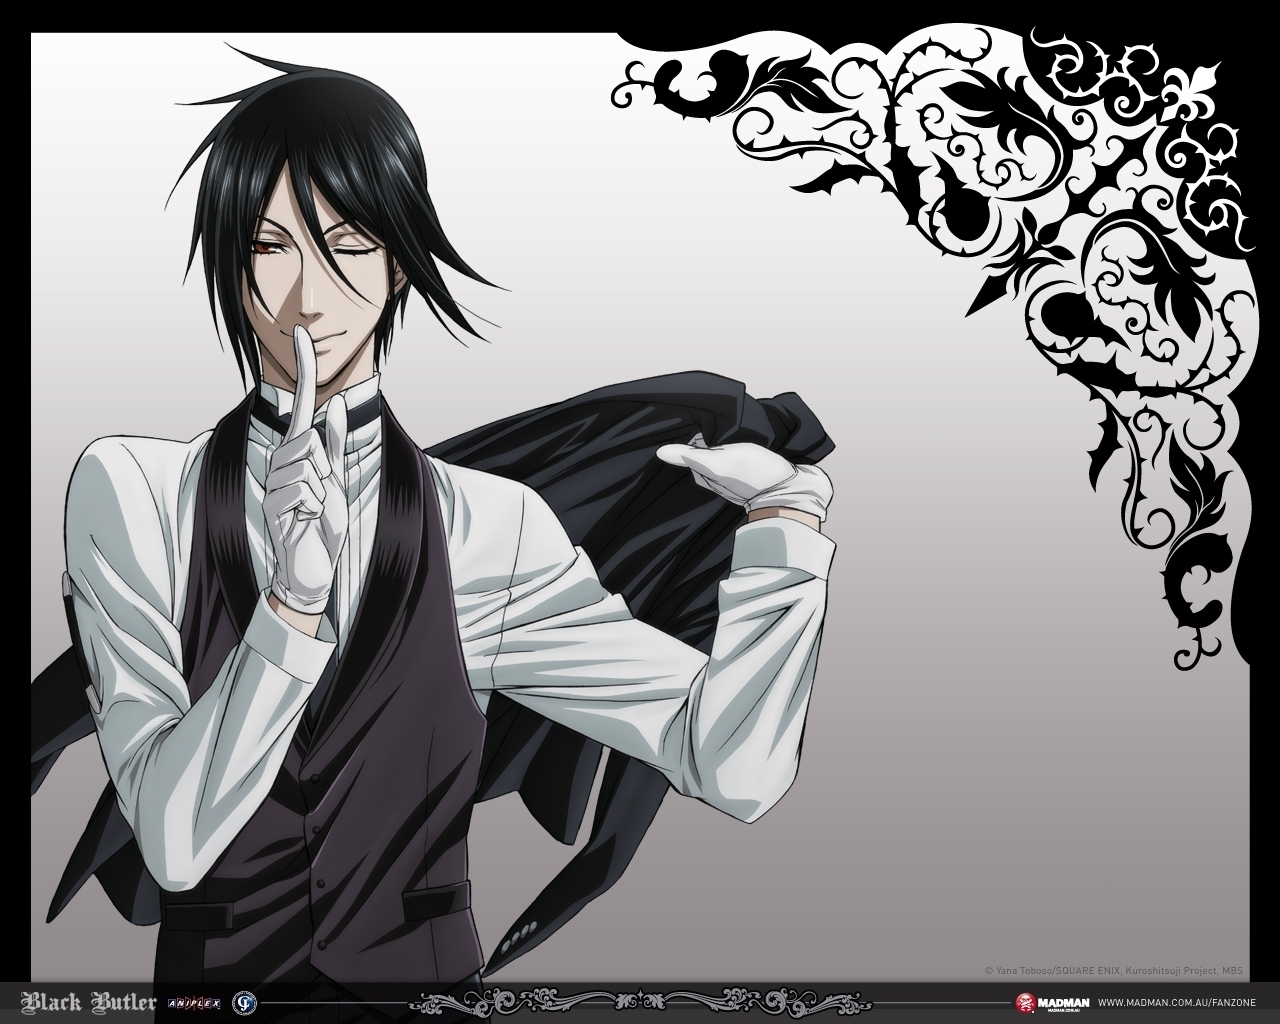 anime black butler wallpapers (desktop, phone, tablet) - awesome